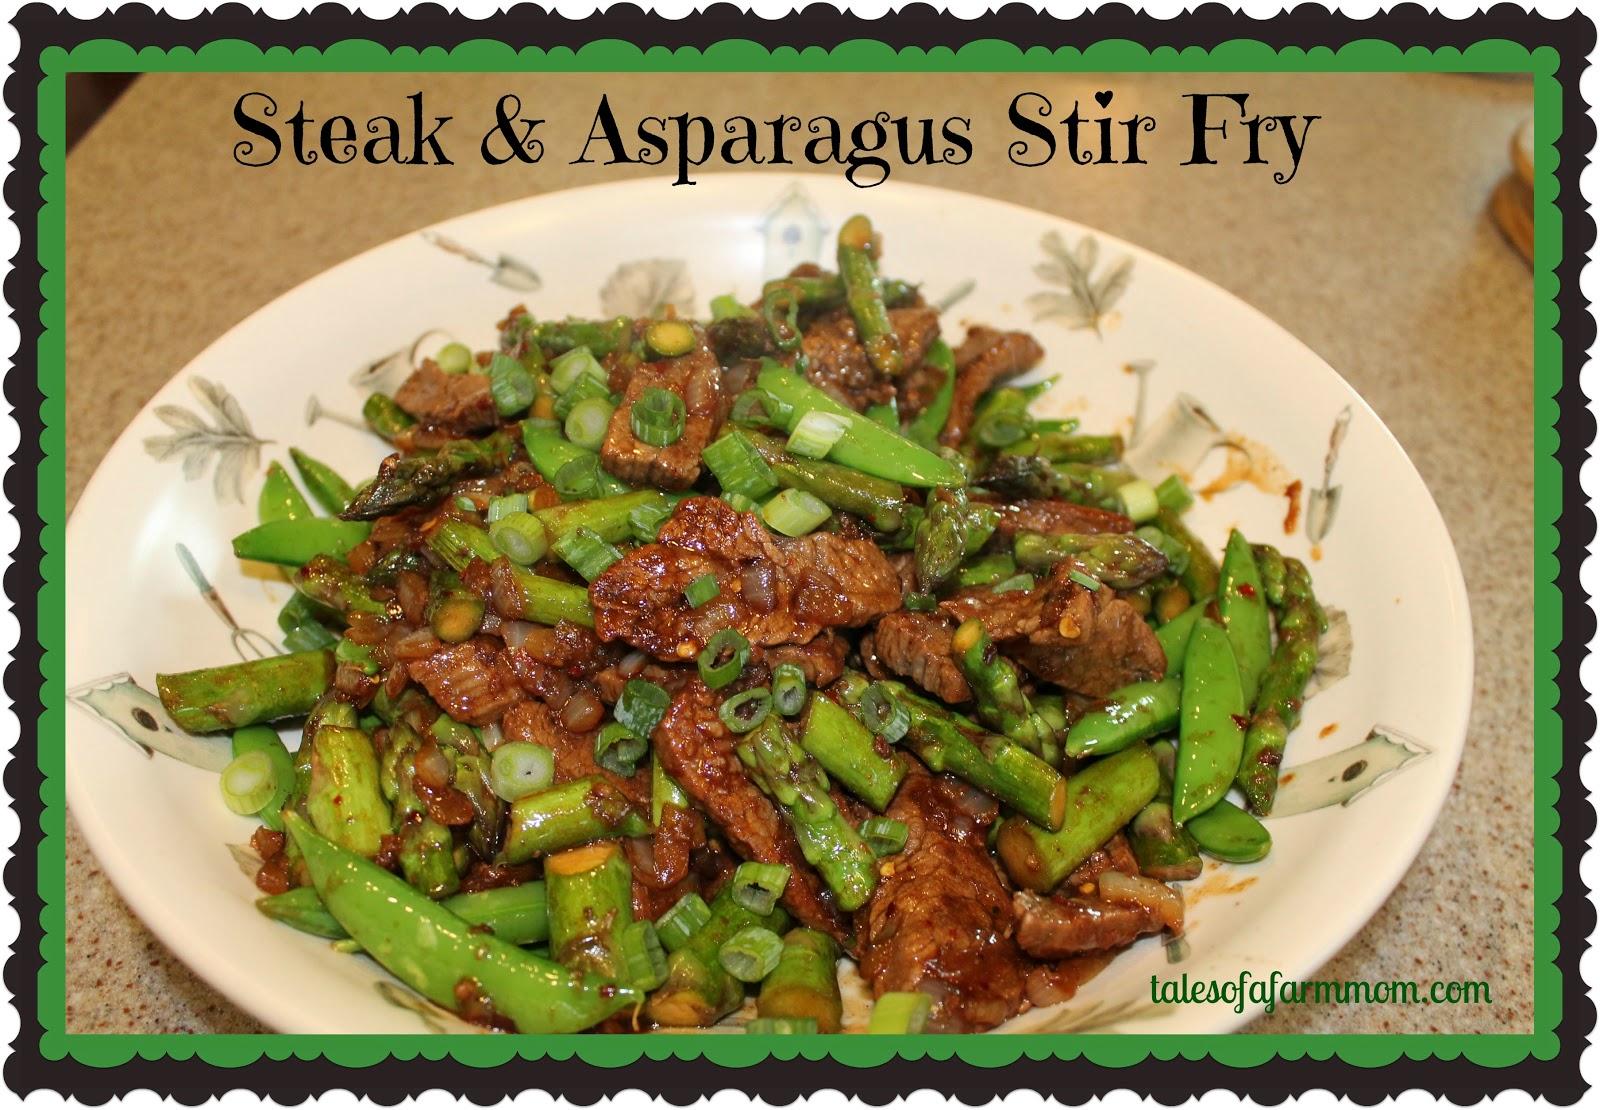 Tales of A Farm Mom: Steak & Asparagus Stir Fry